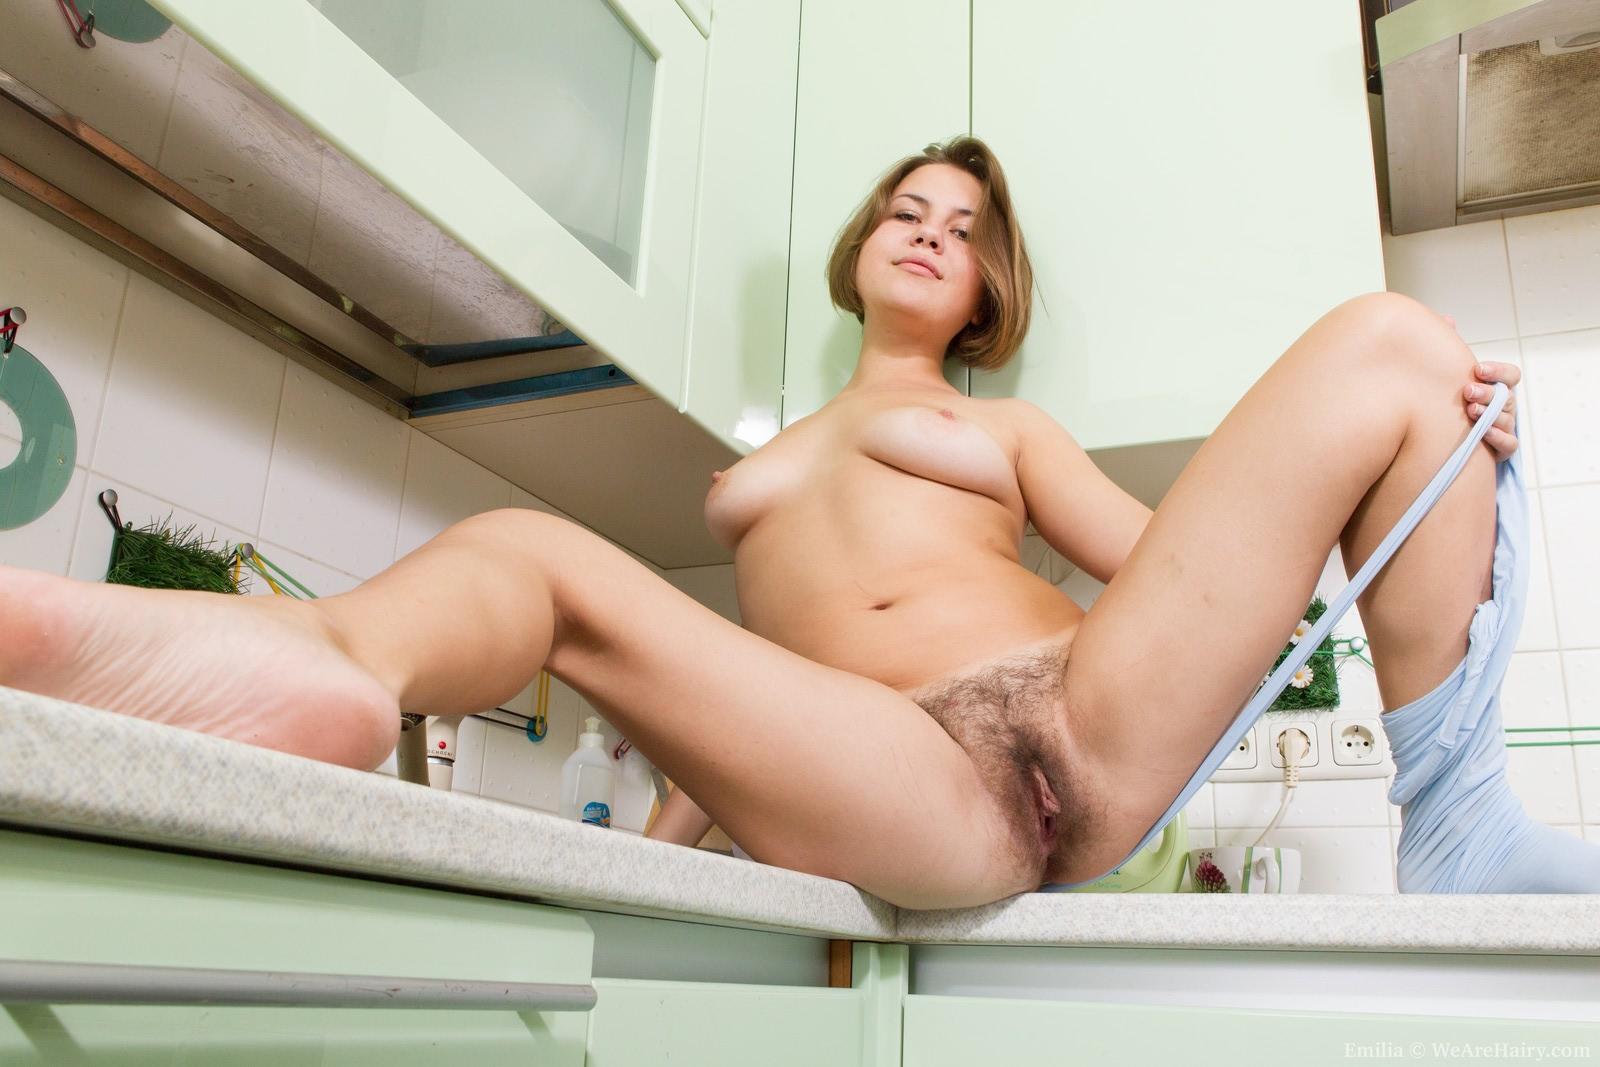 Girlfriend thigh highs nude